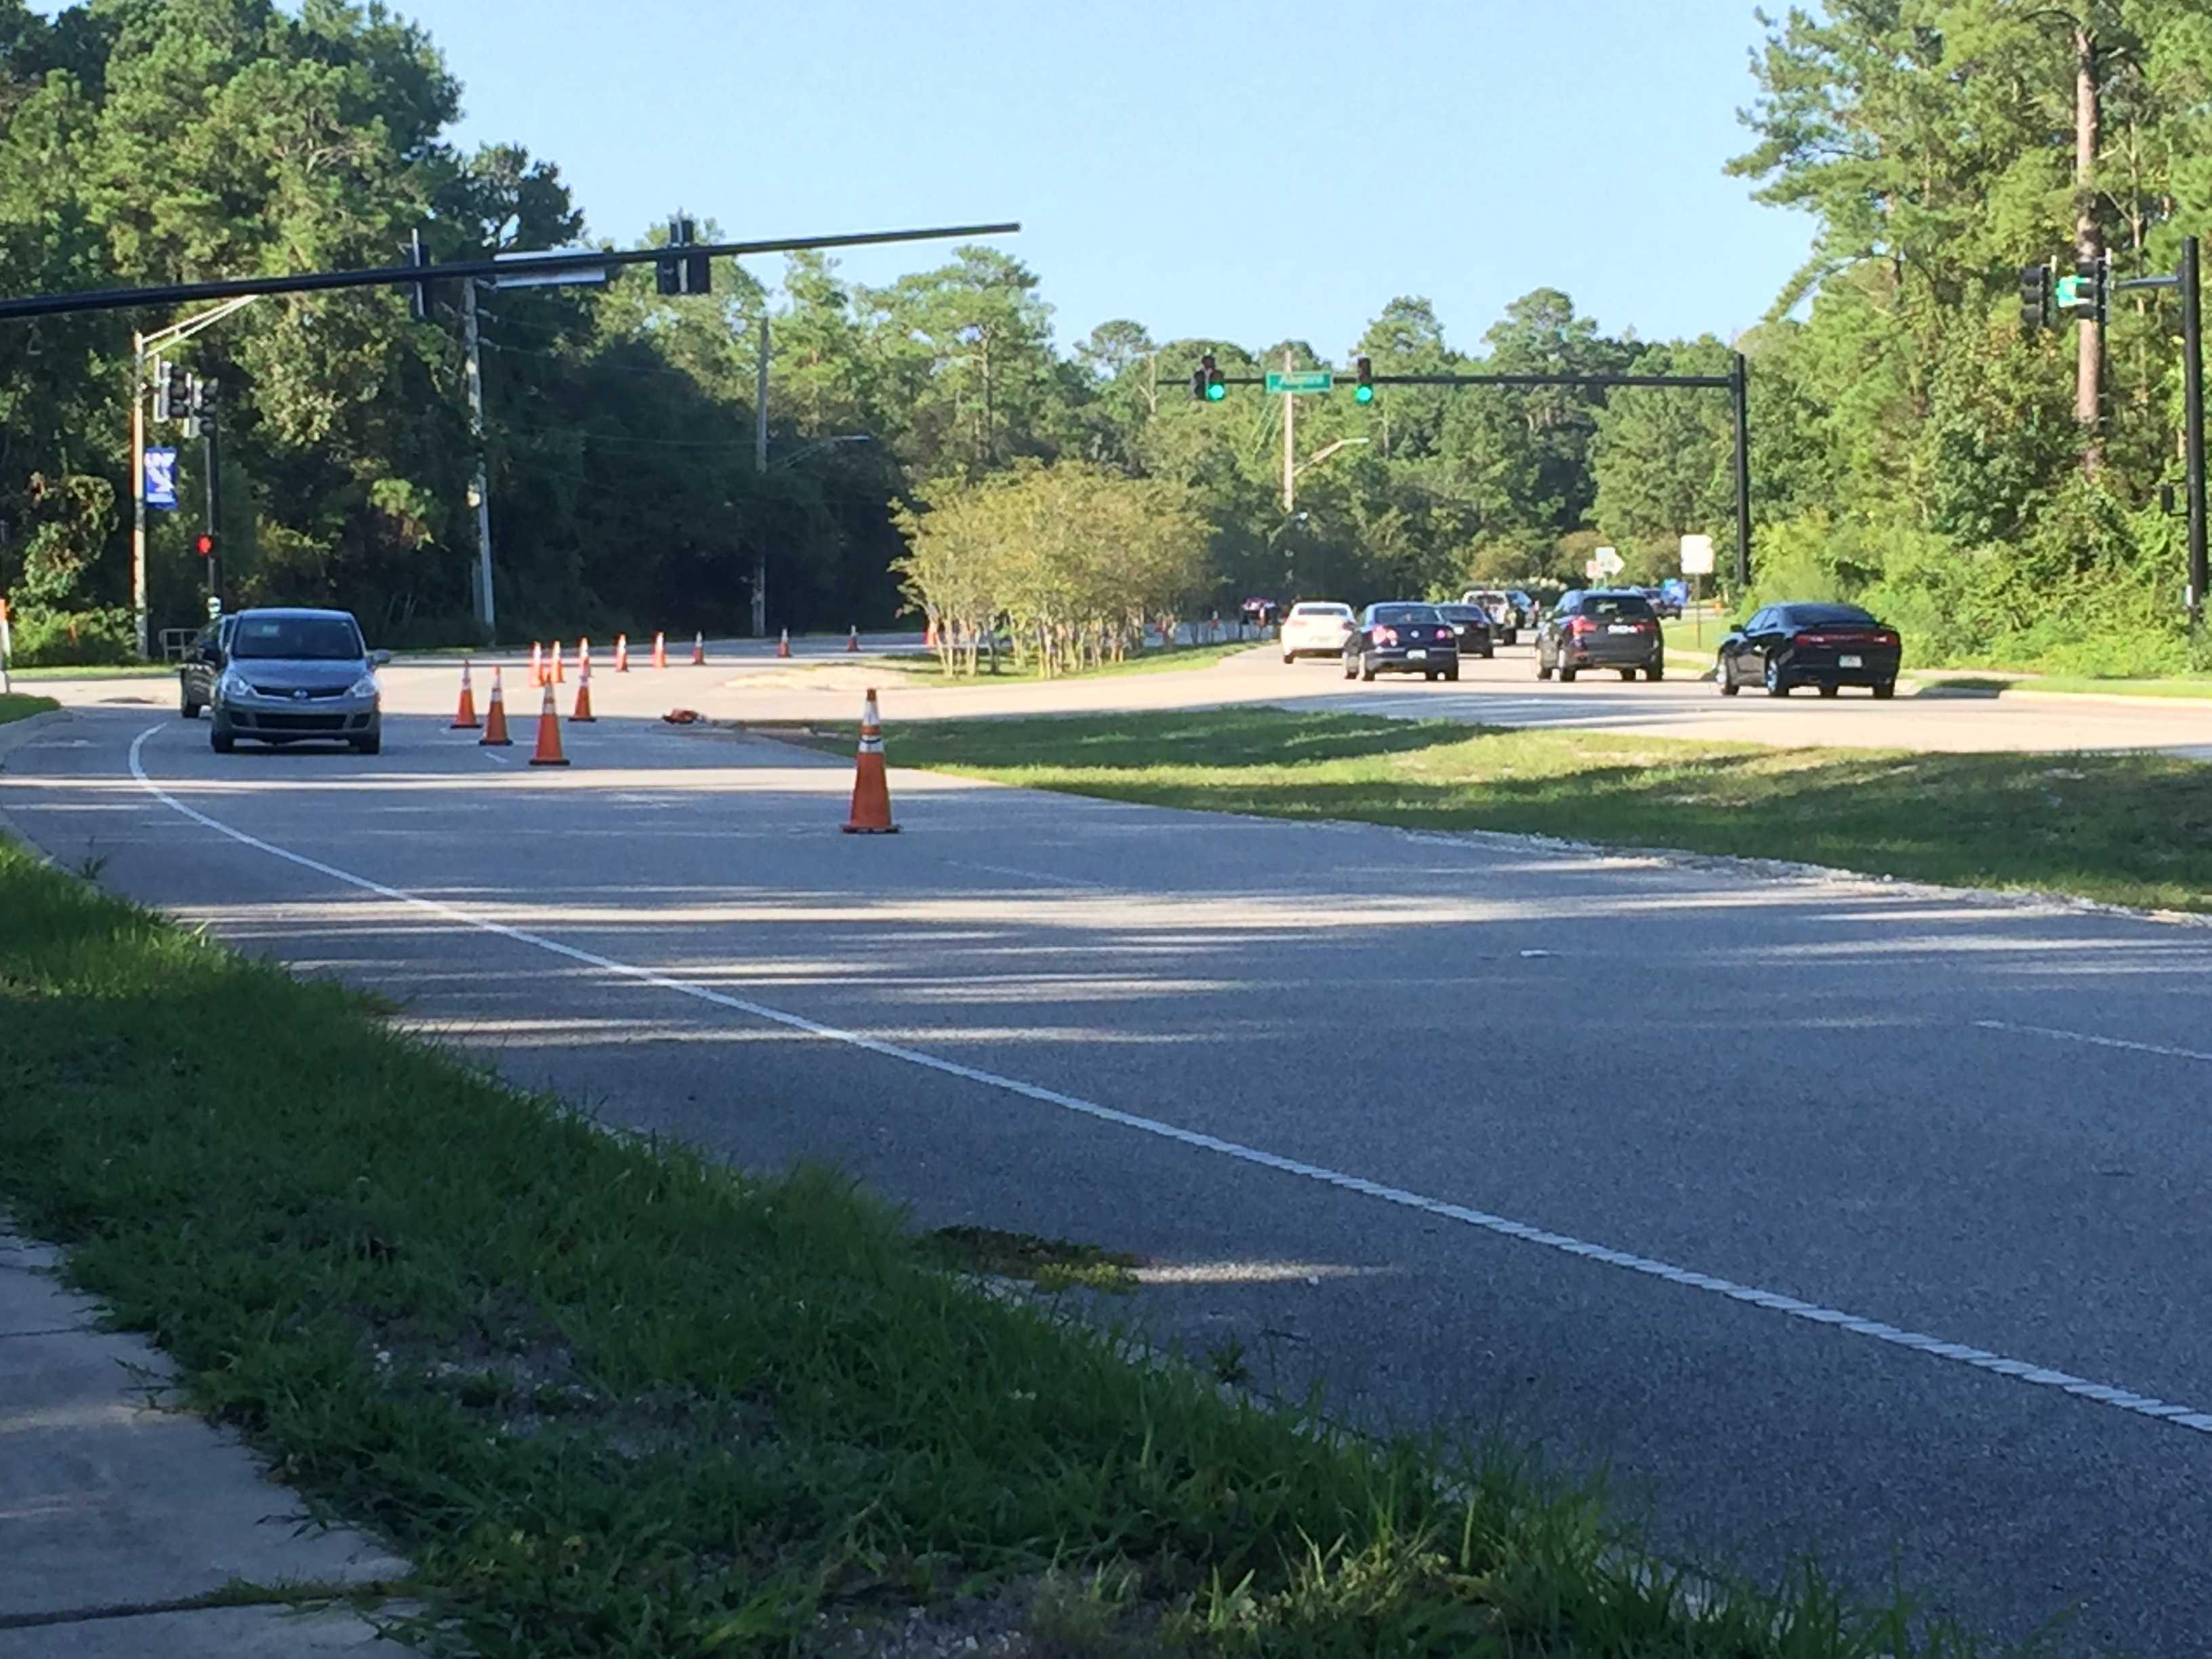 Kernan lane closure could cause traffic coming to campus